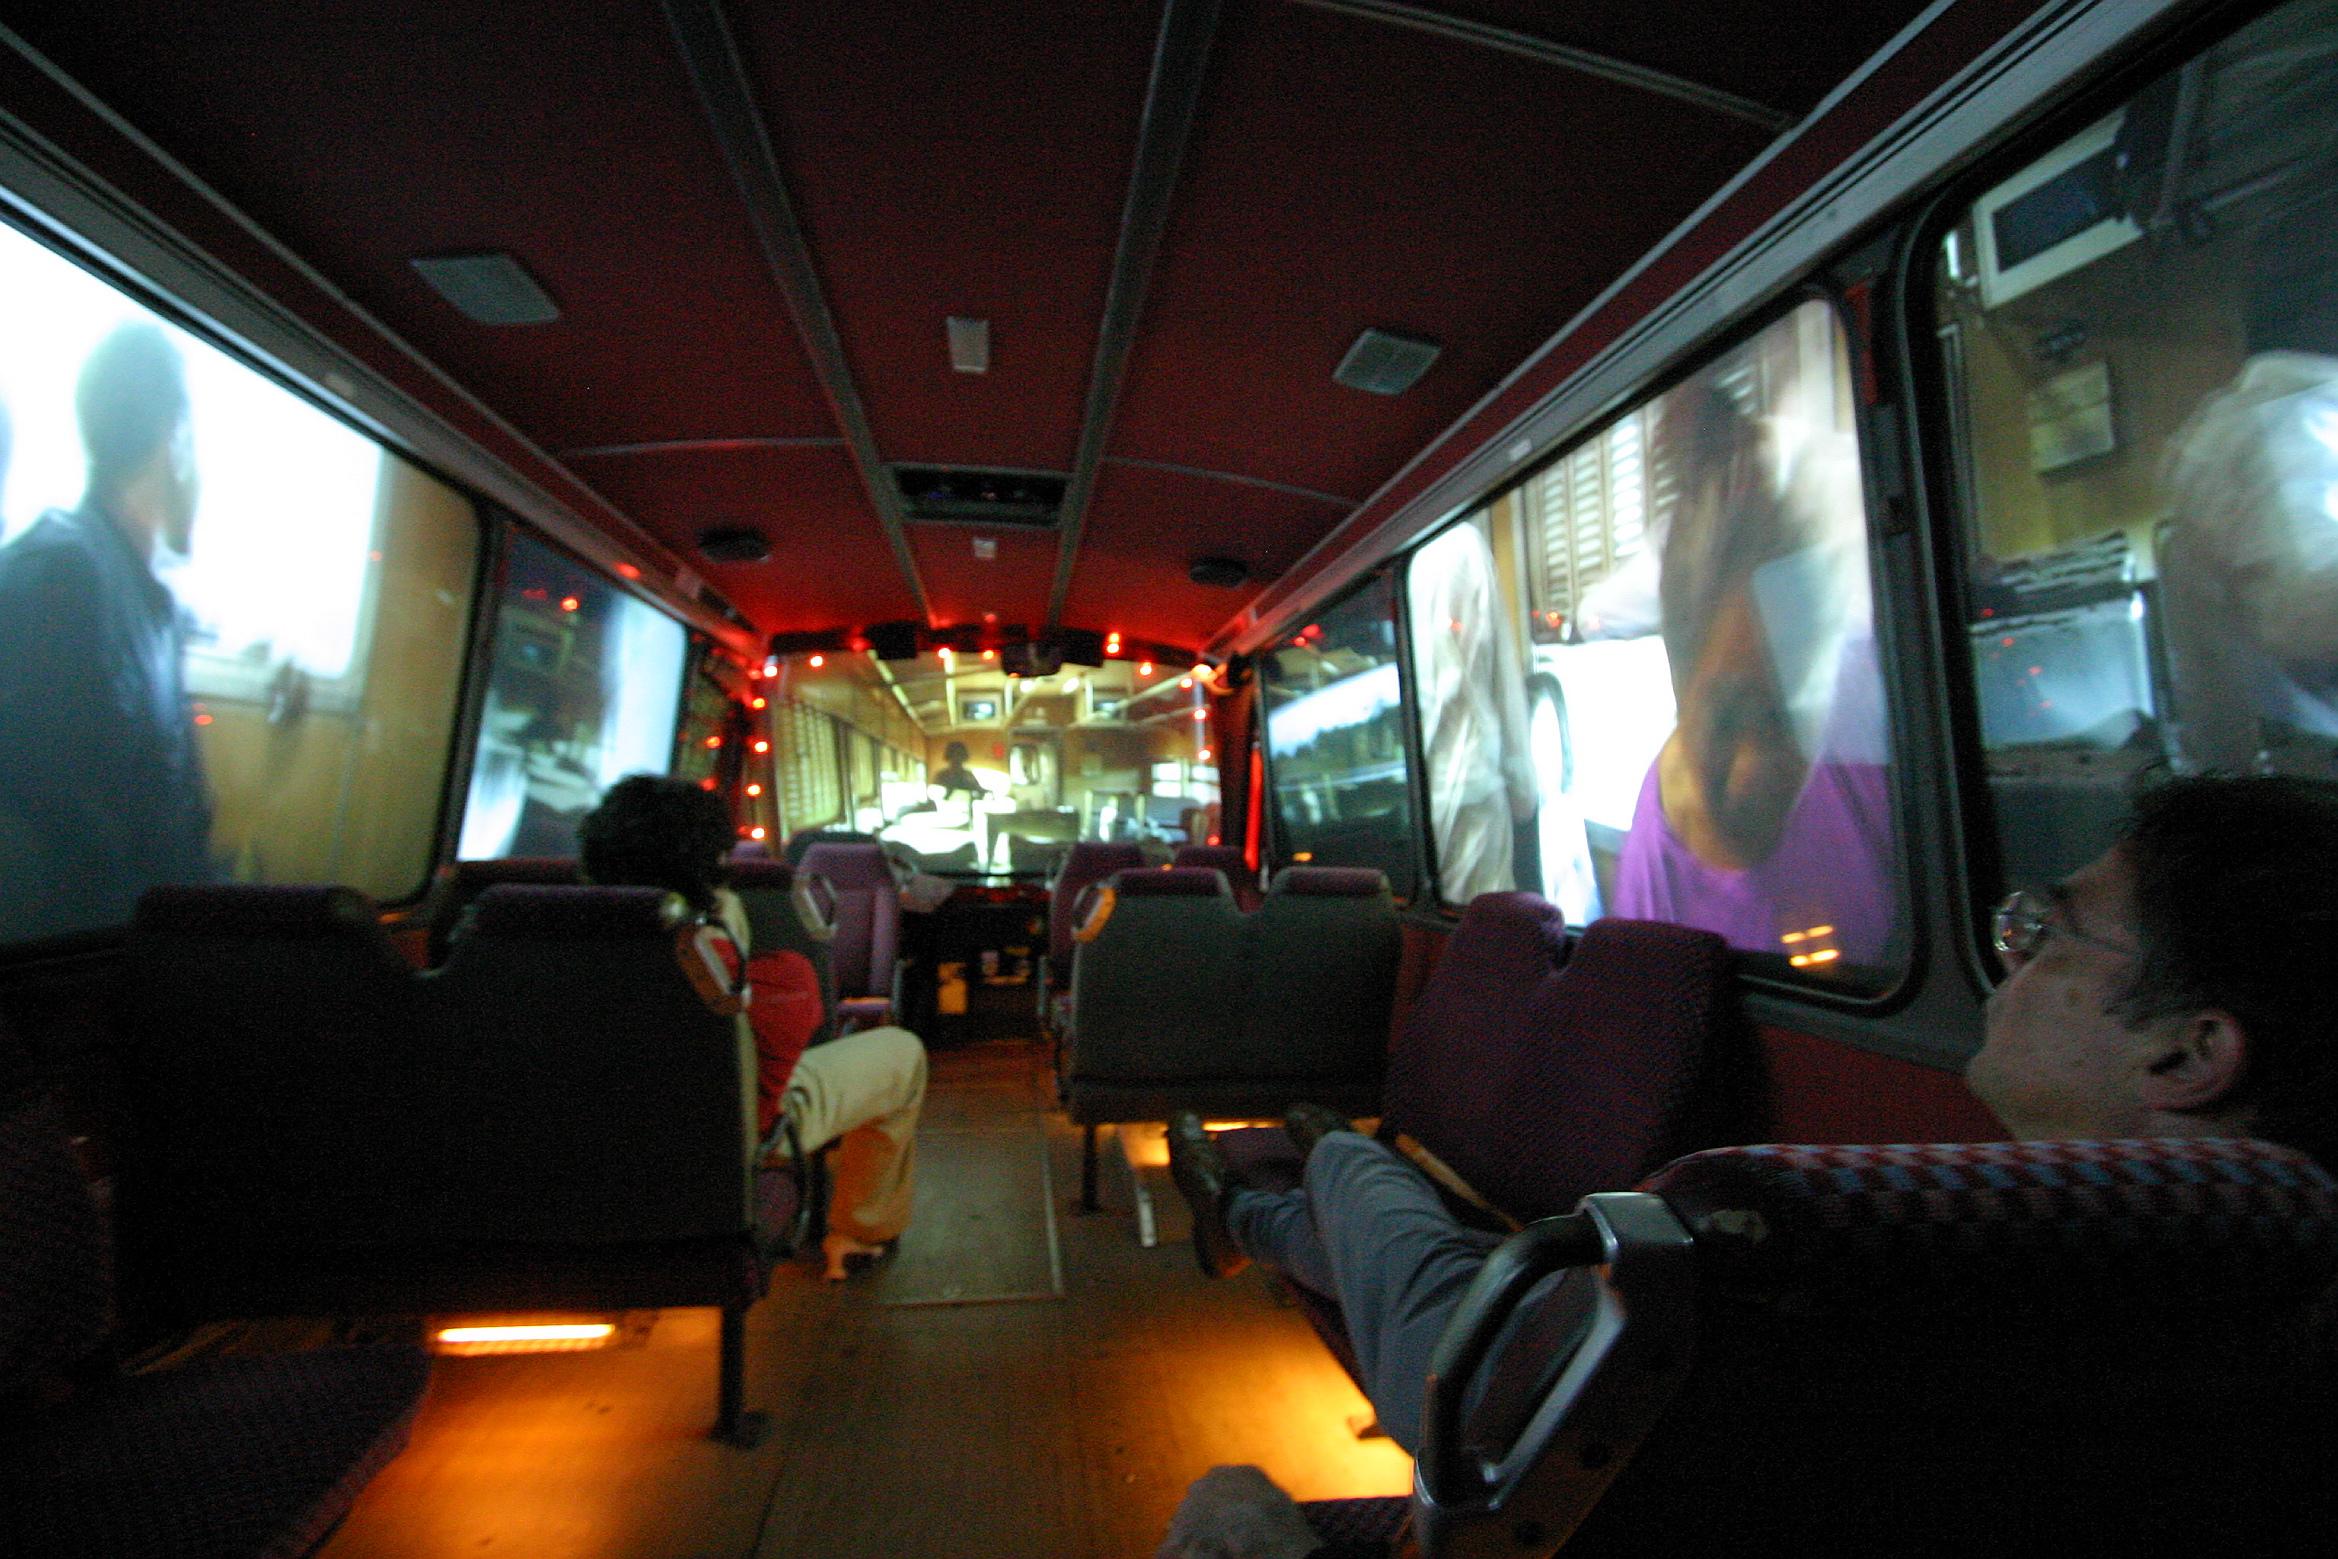 PHOTO BUS - 2207